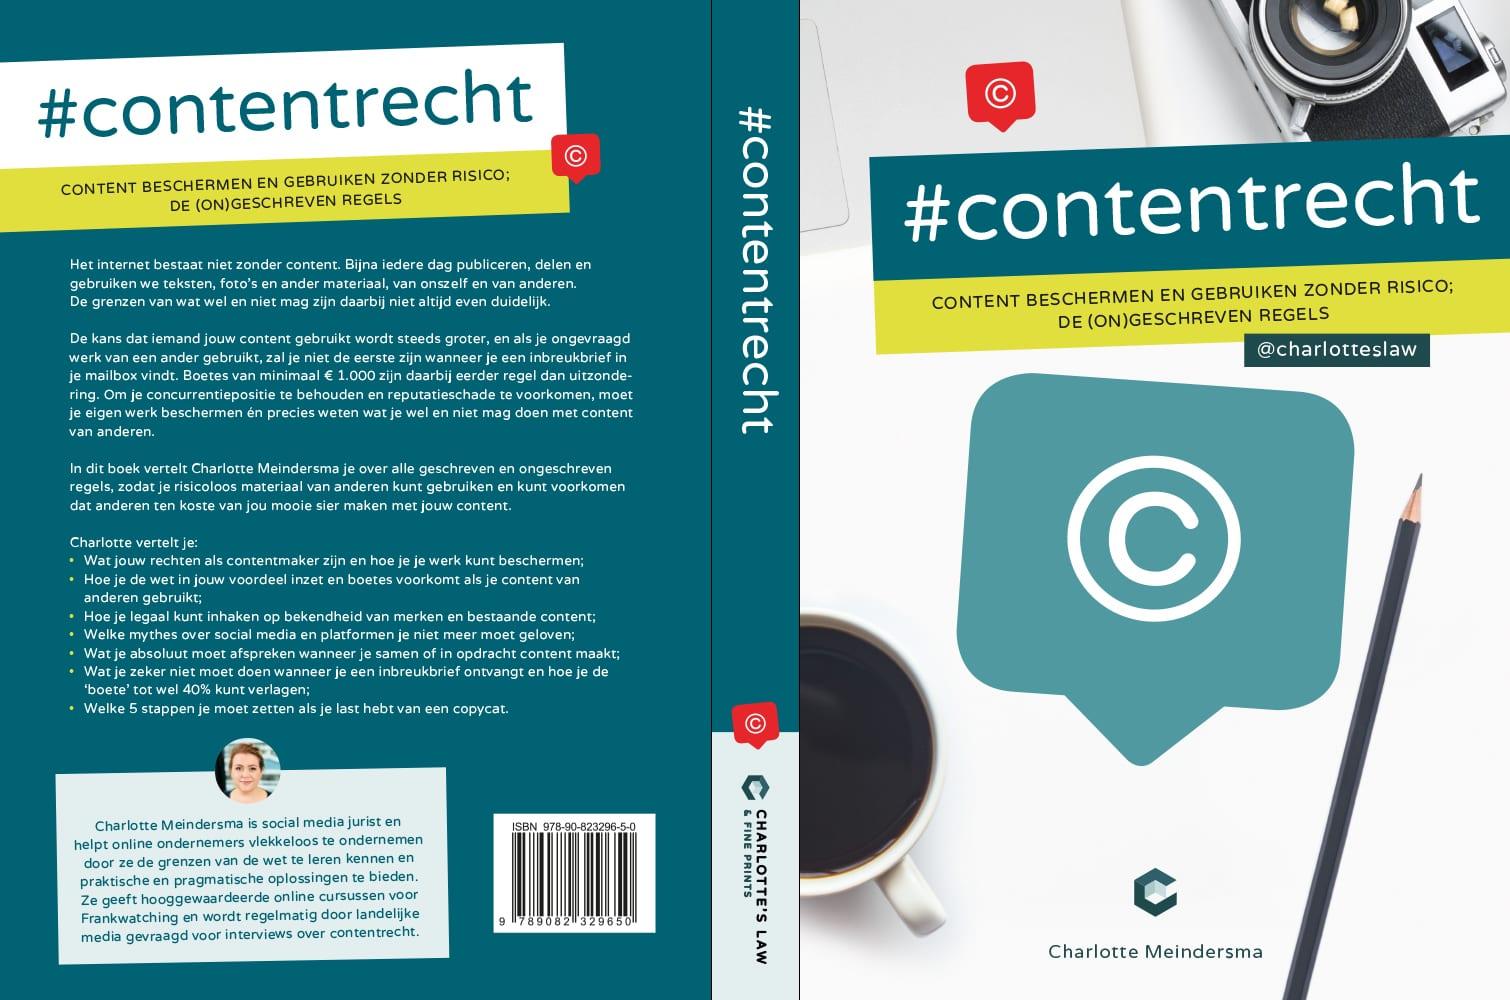 Contentrecht omslag